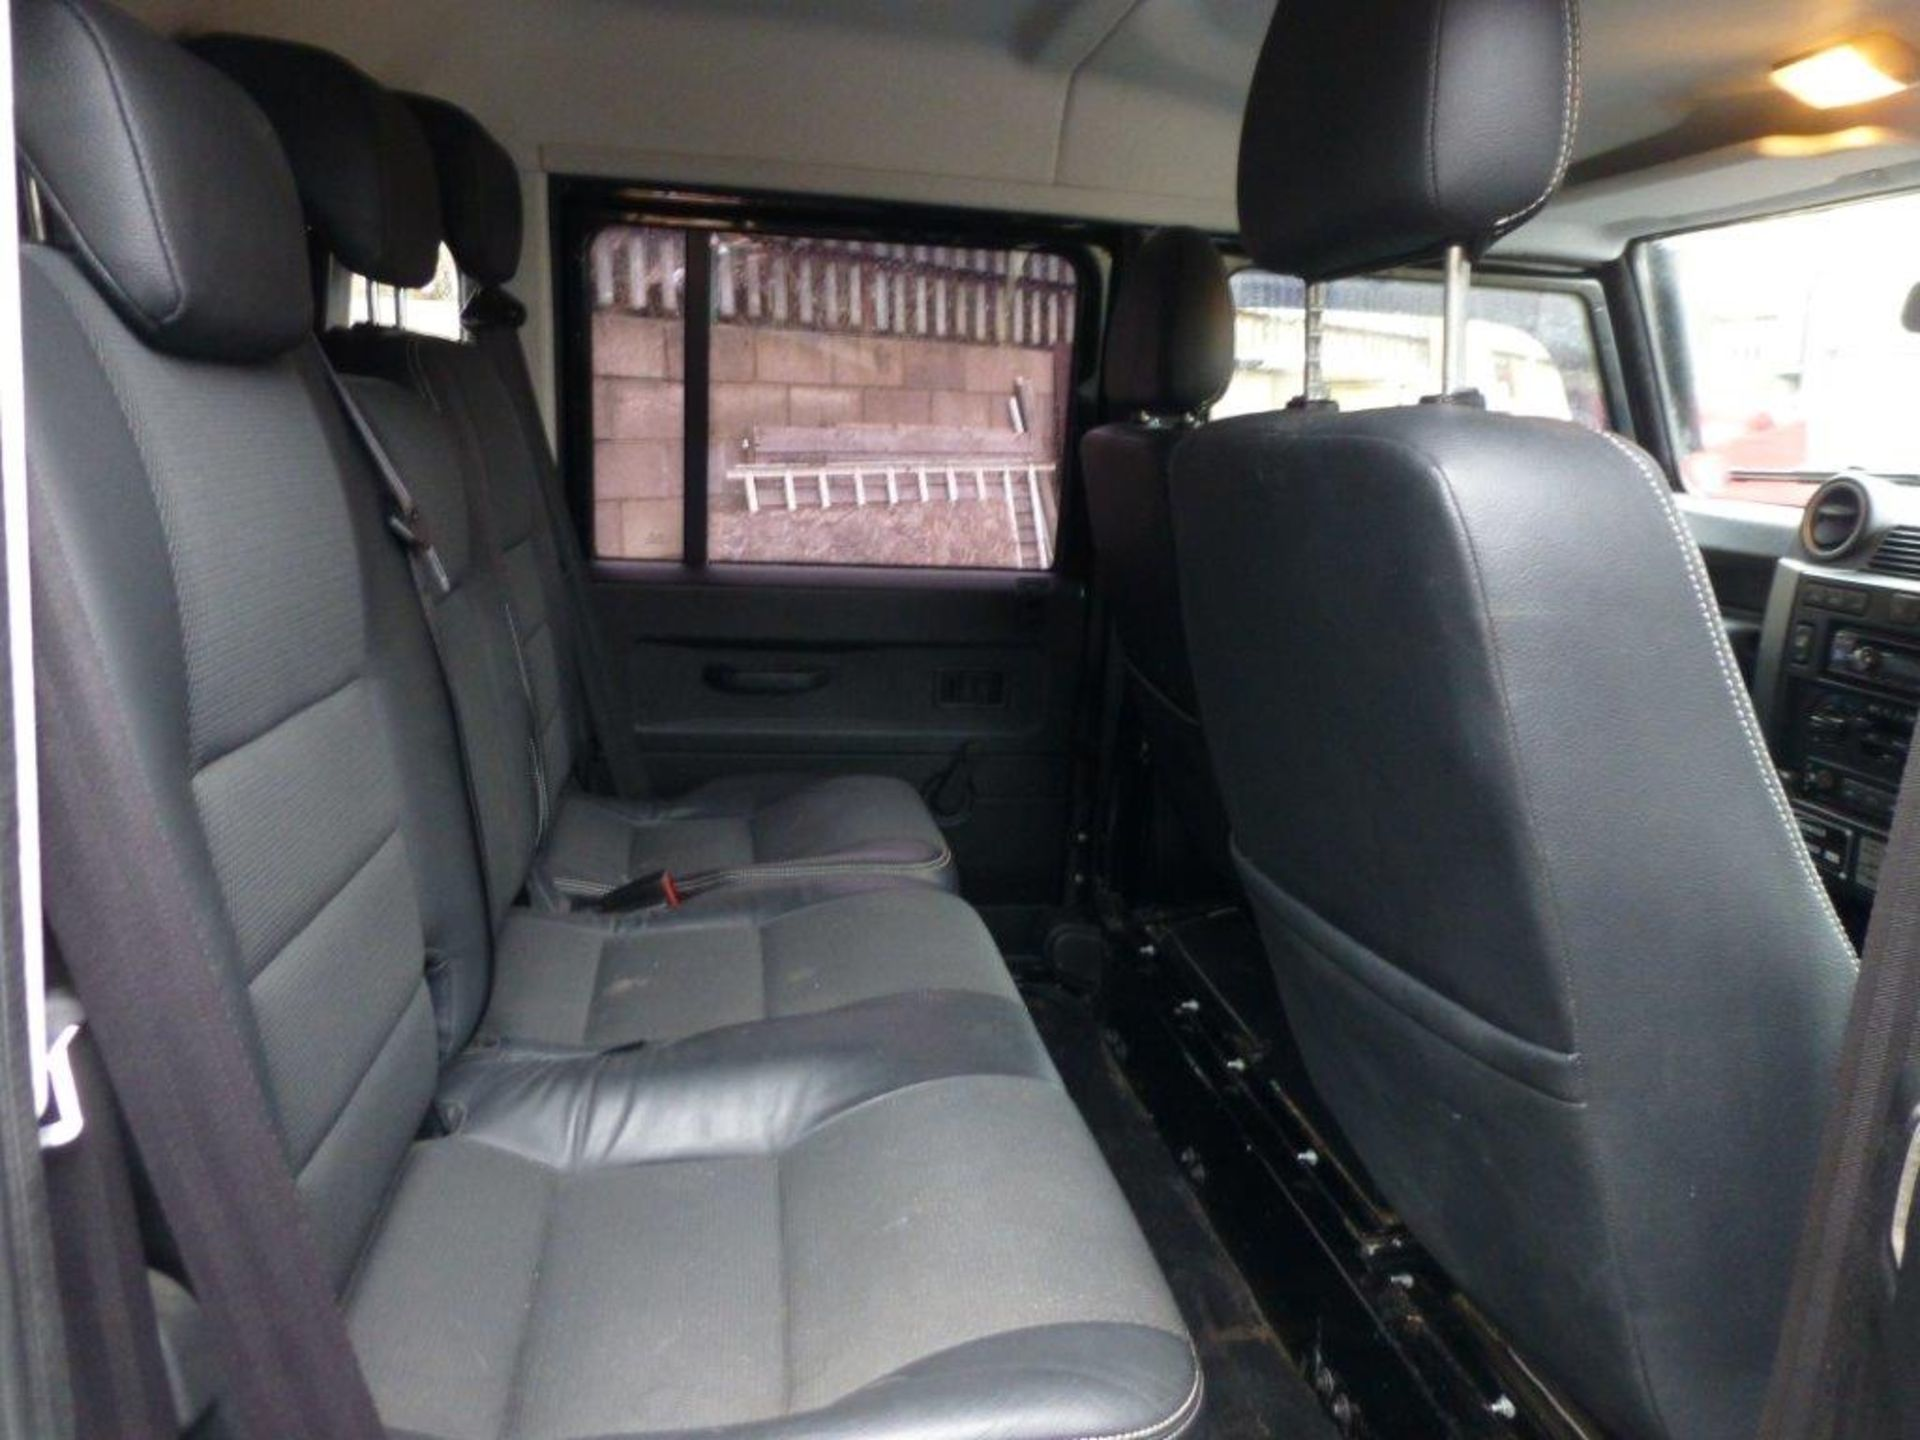 Land Rover Defender 110 XS Bowler double cab pickup TDCi (2.2). Reg no. T9 FNK. Reg. date 23/03/ - Image 13 of 13